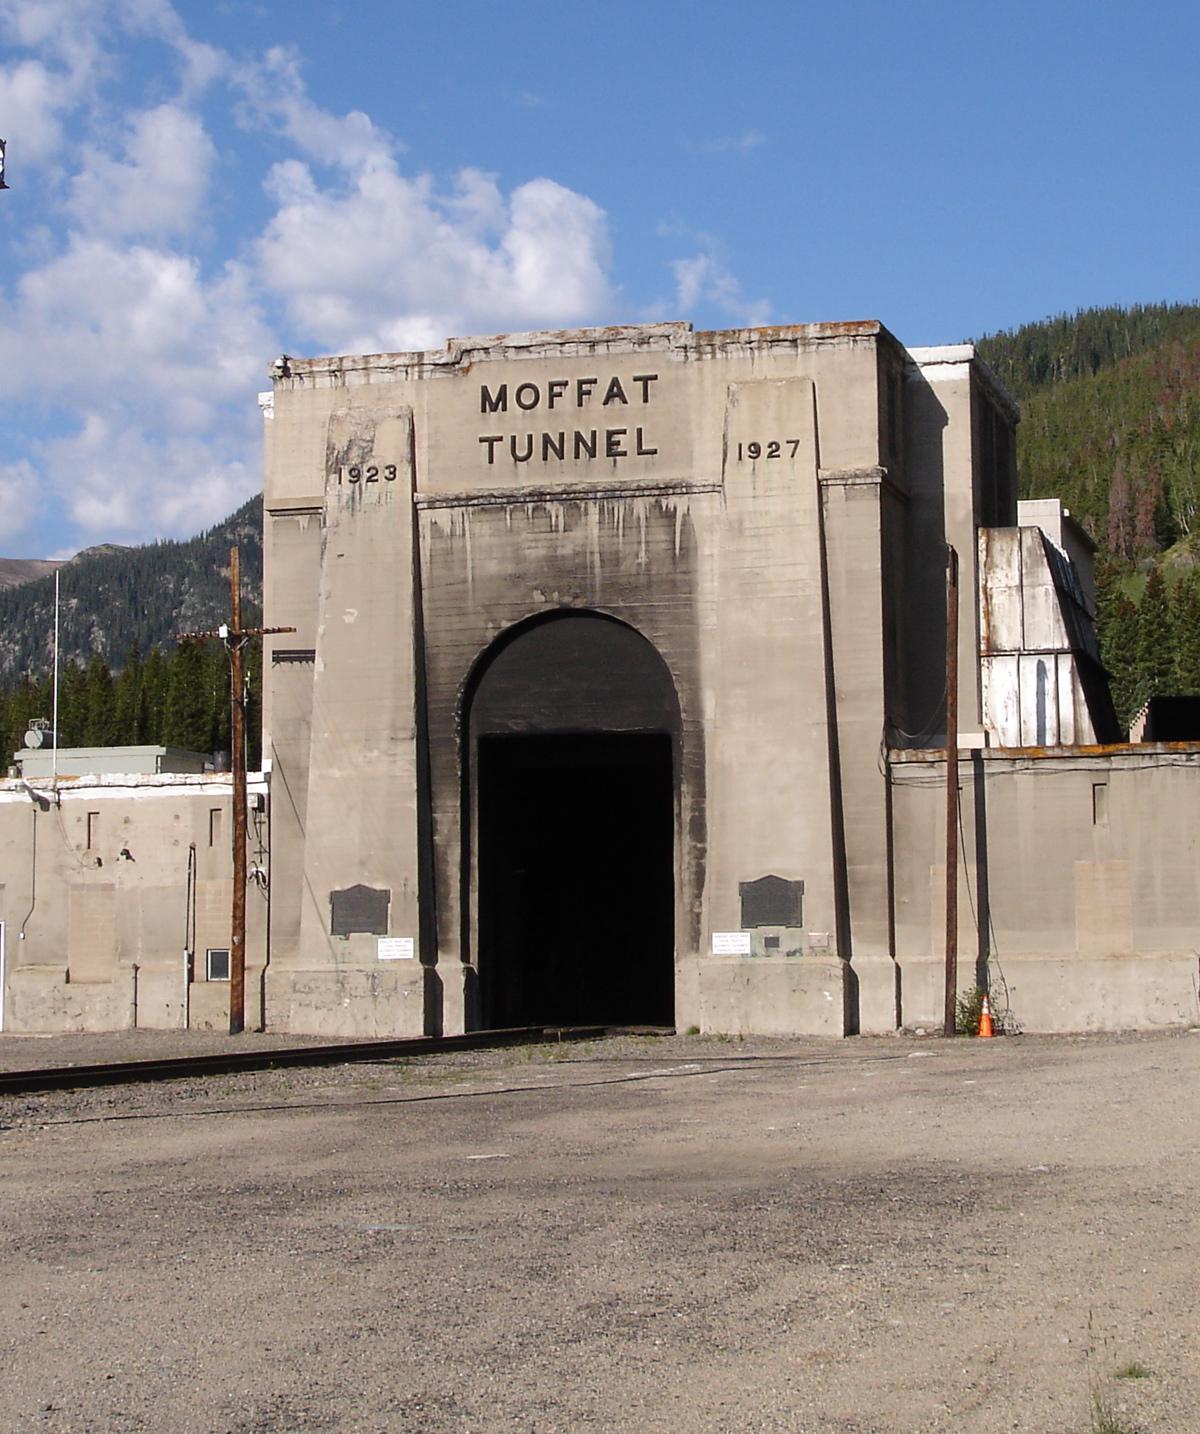 MoffatAppliances.ca